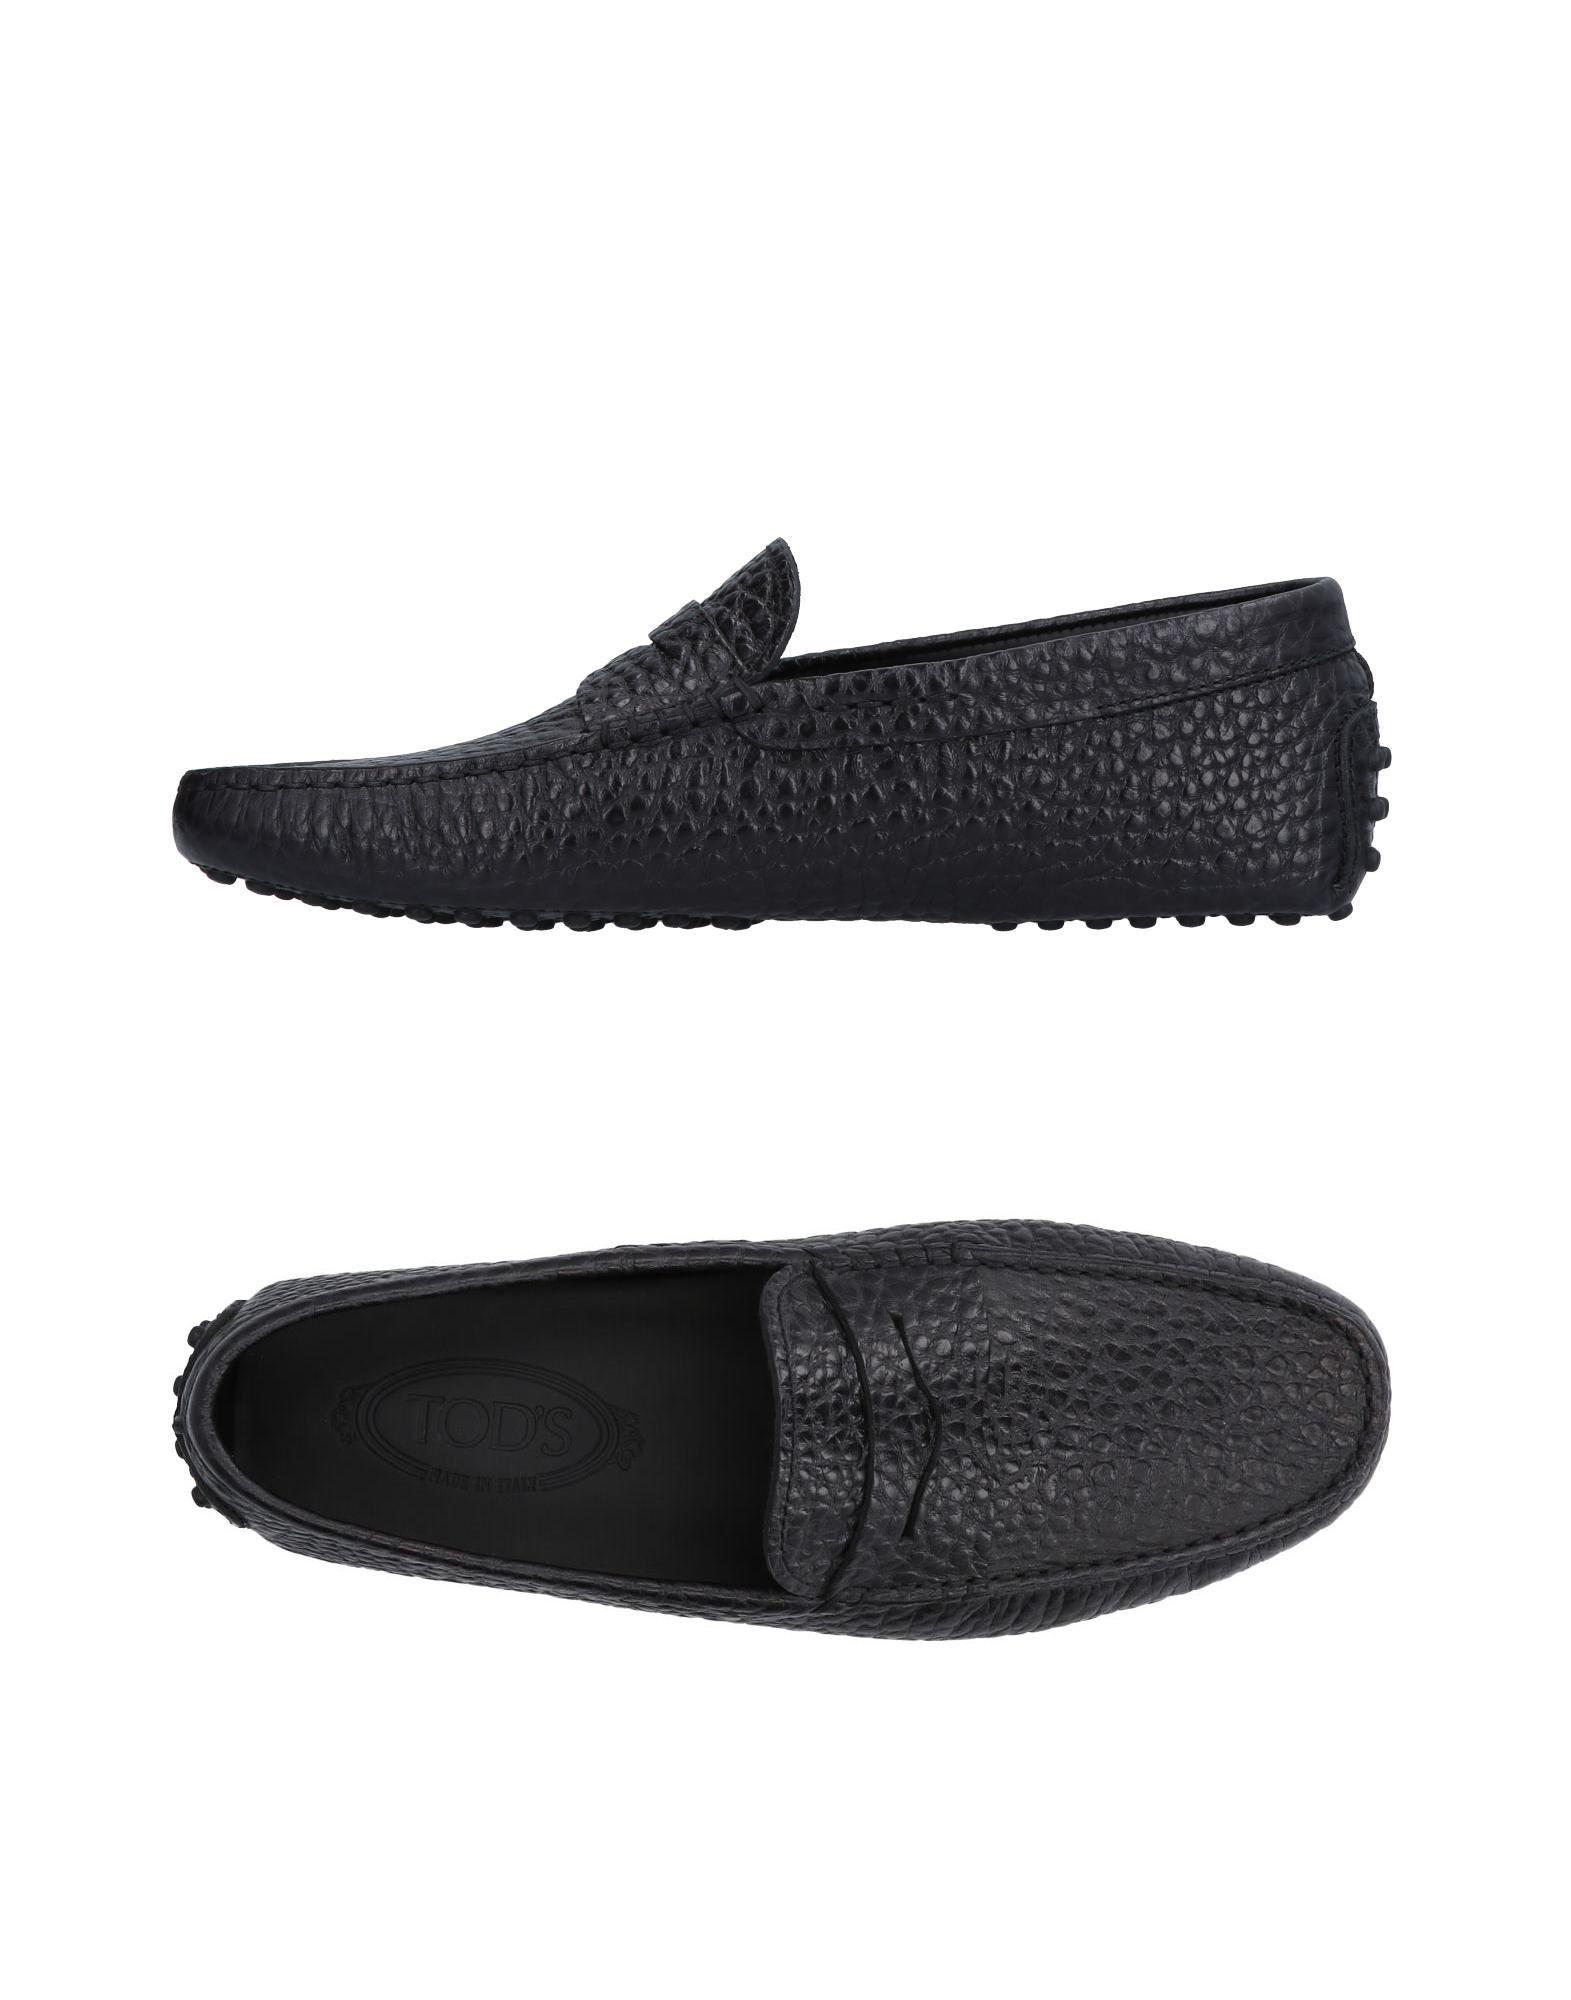 Tod's Mokassins Herren  11484905CR Gute Qualität beliebte Schuhe